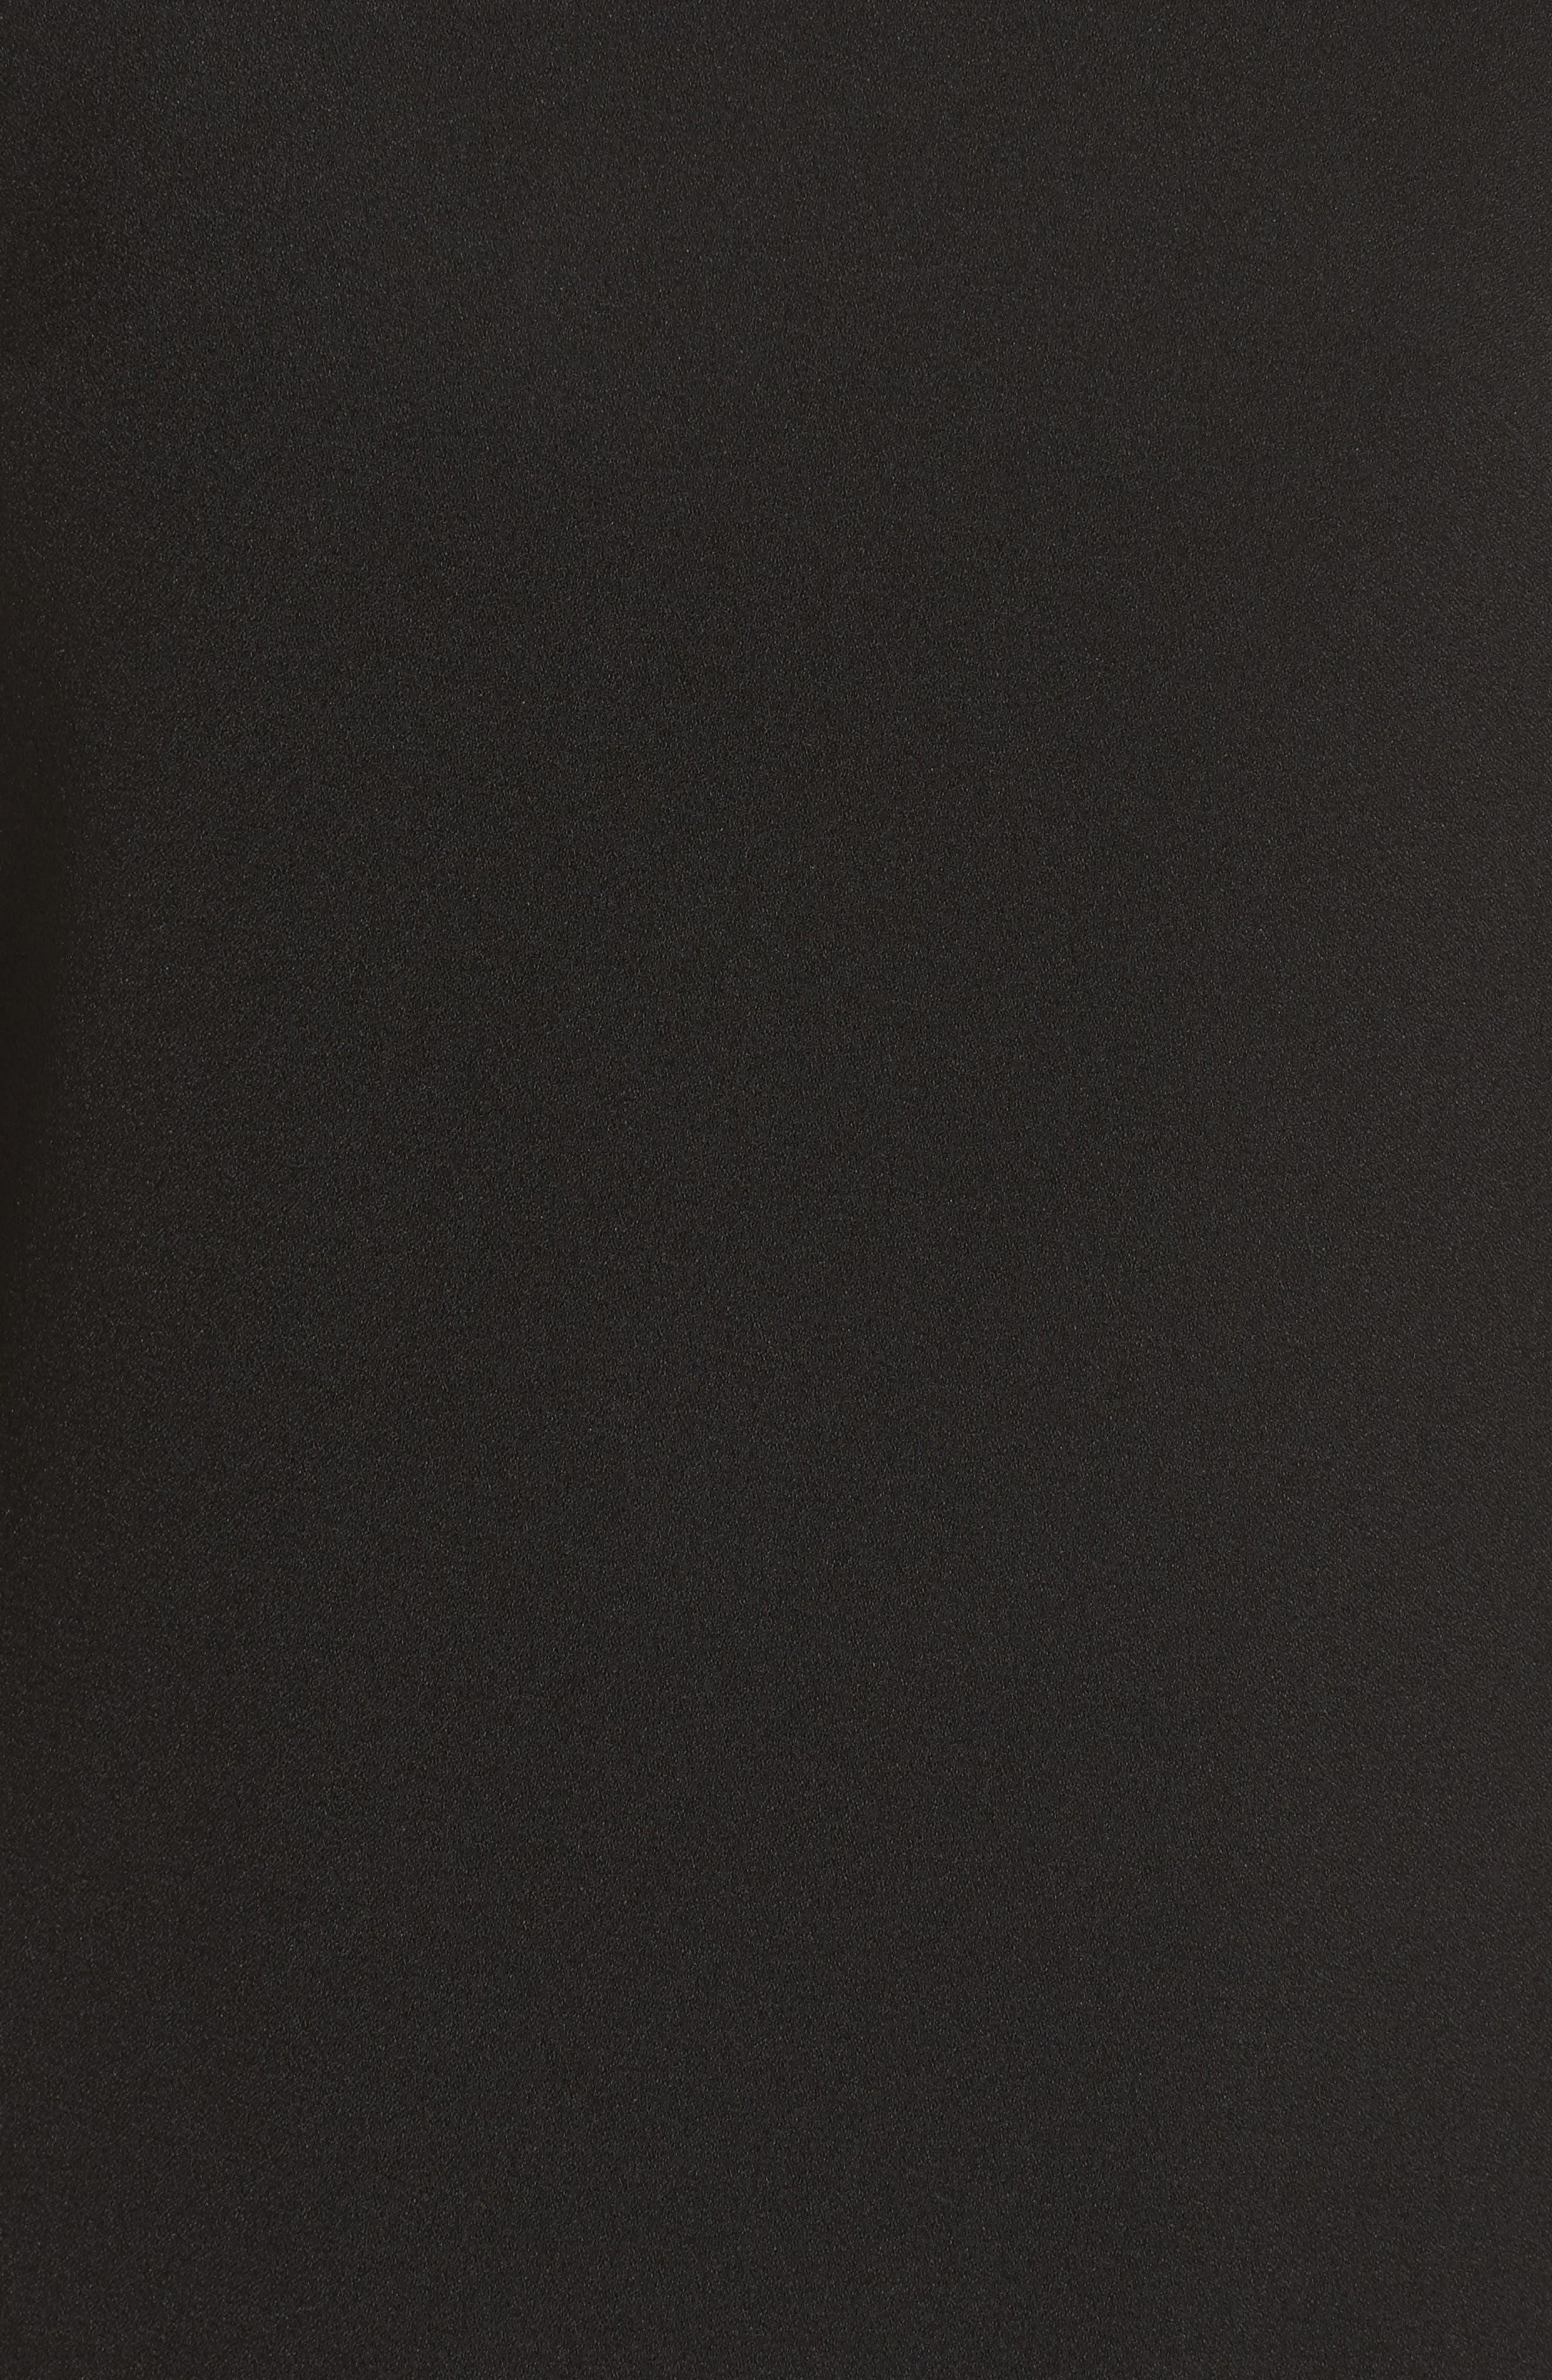 Bloused Sleeve Shift Dress,                             Alternate thumbnail 6, color,                             001